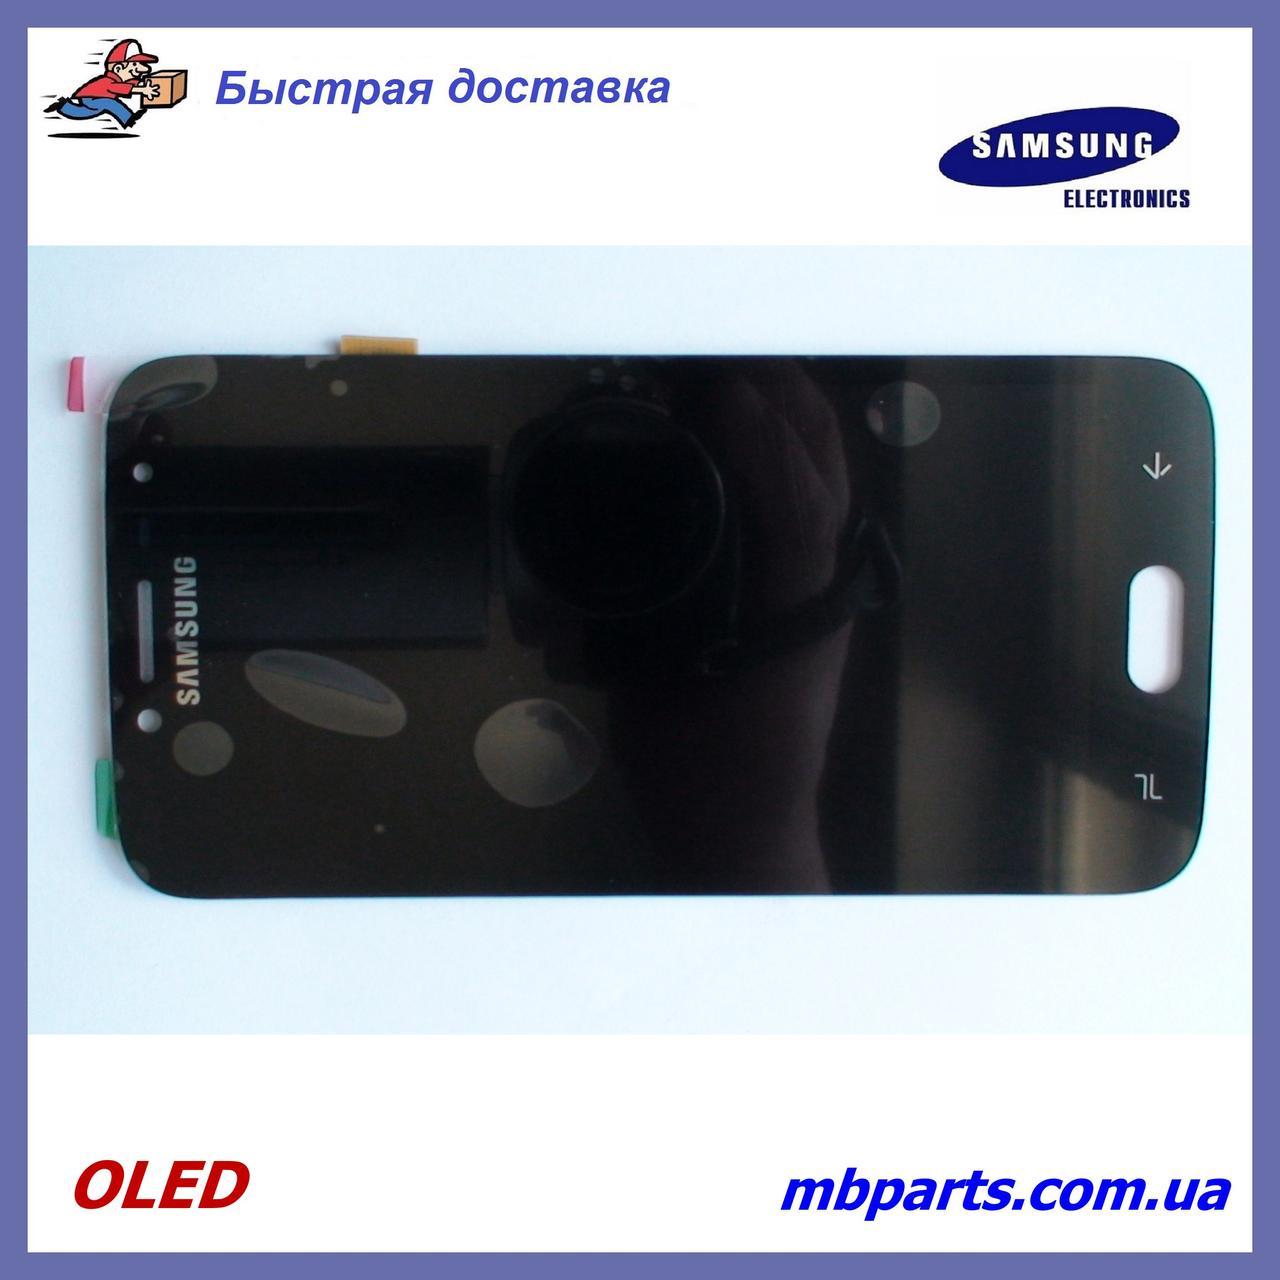 Дисплей с сенсором Samsung J250 Galaxy J2 2018 OLED Black !